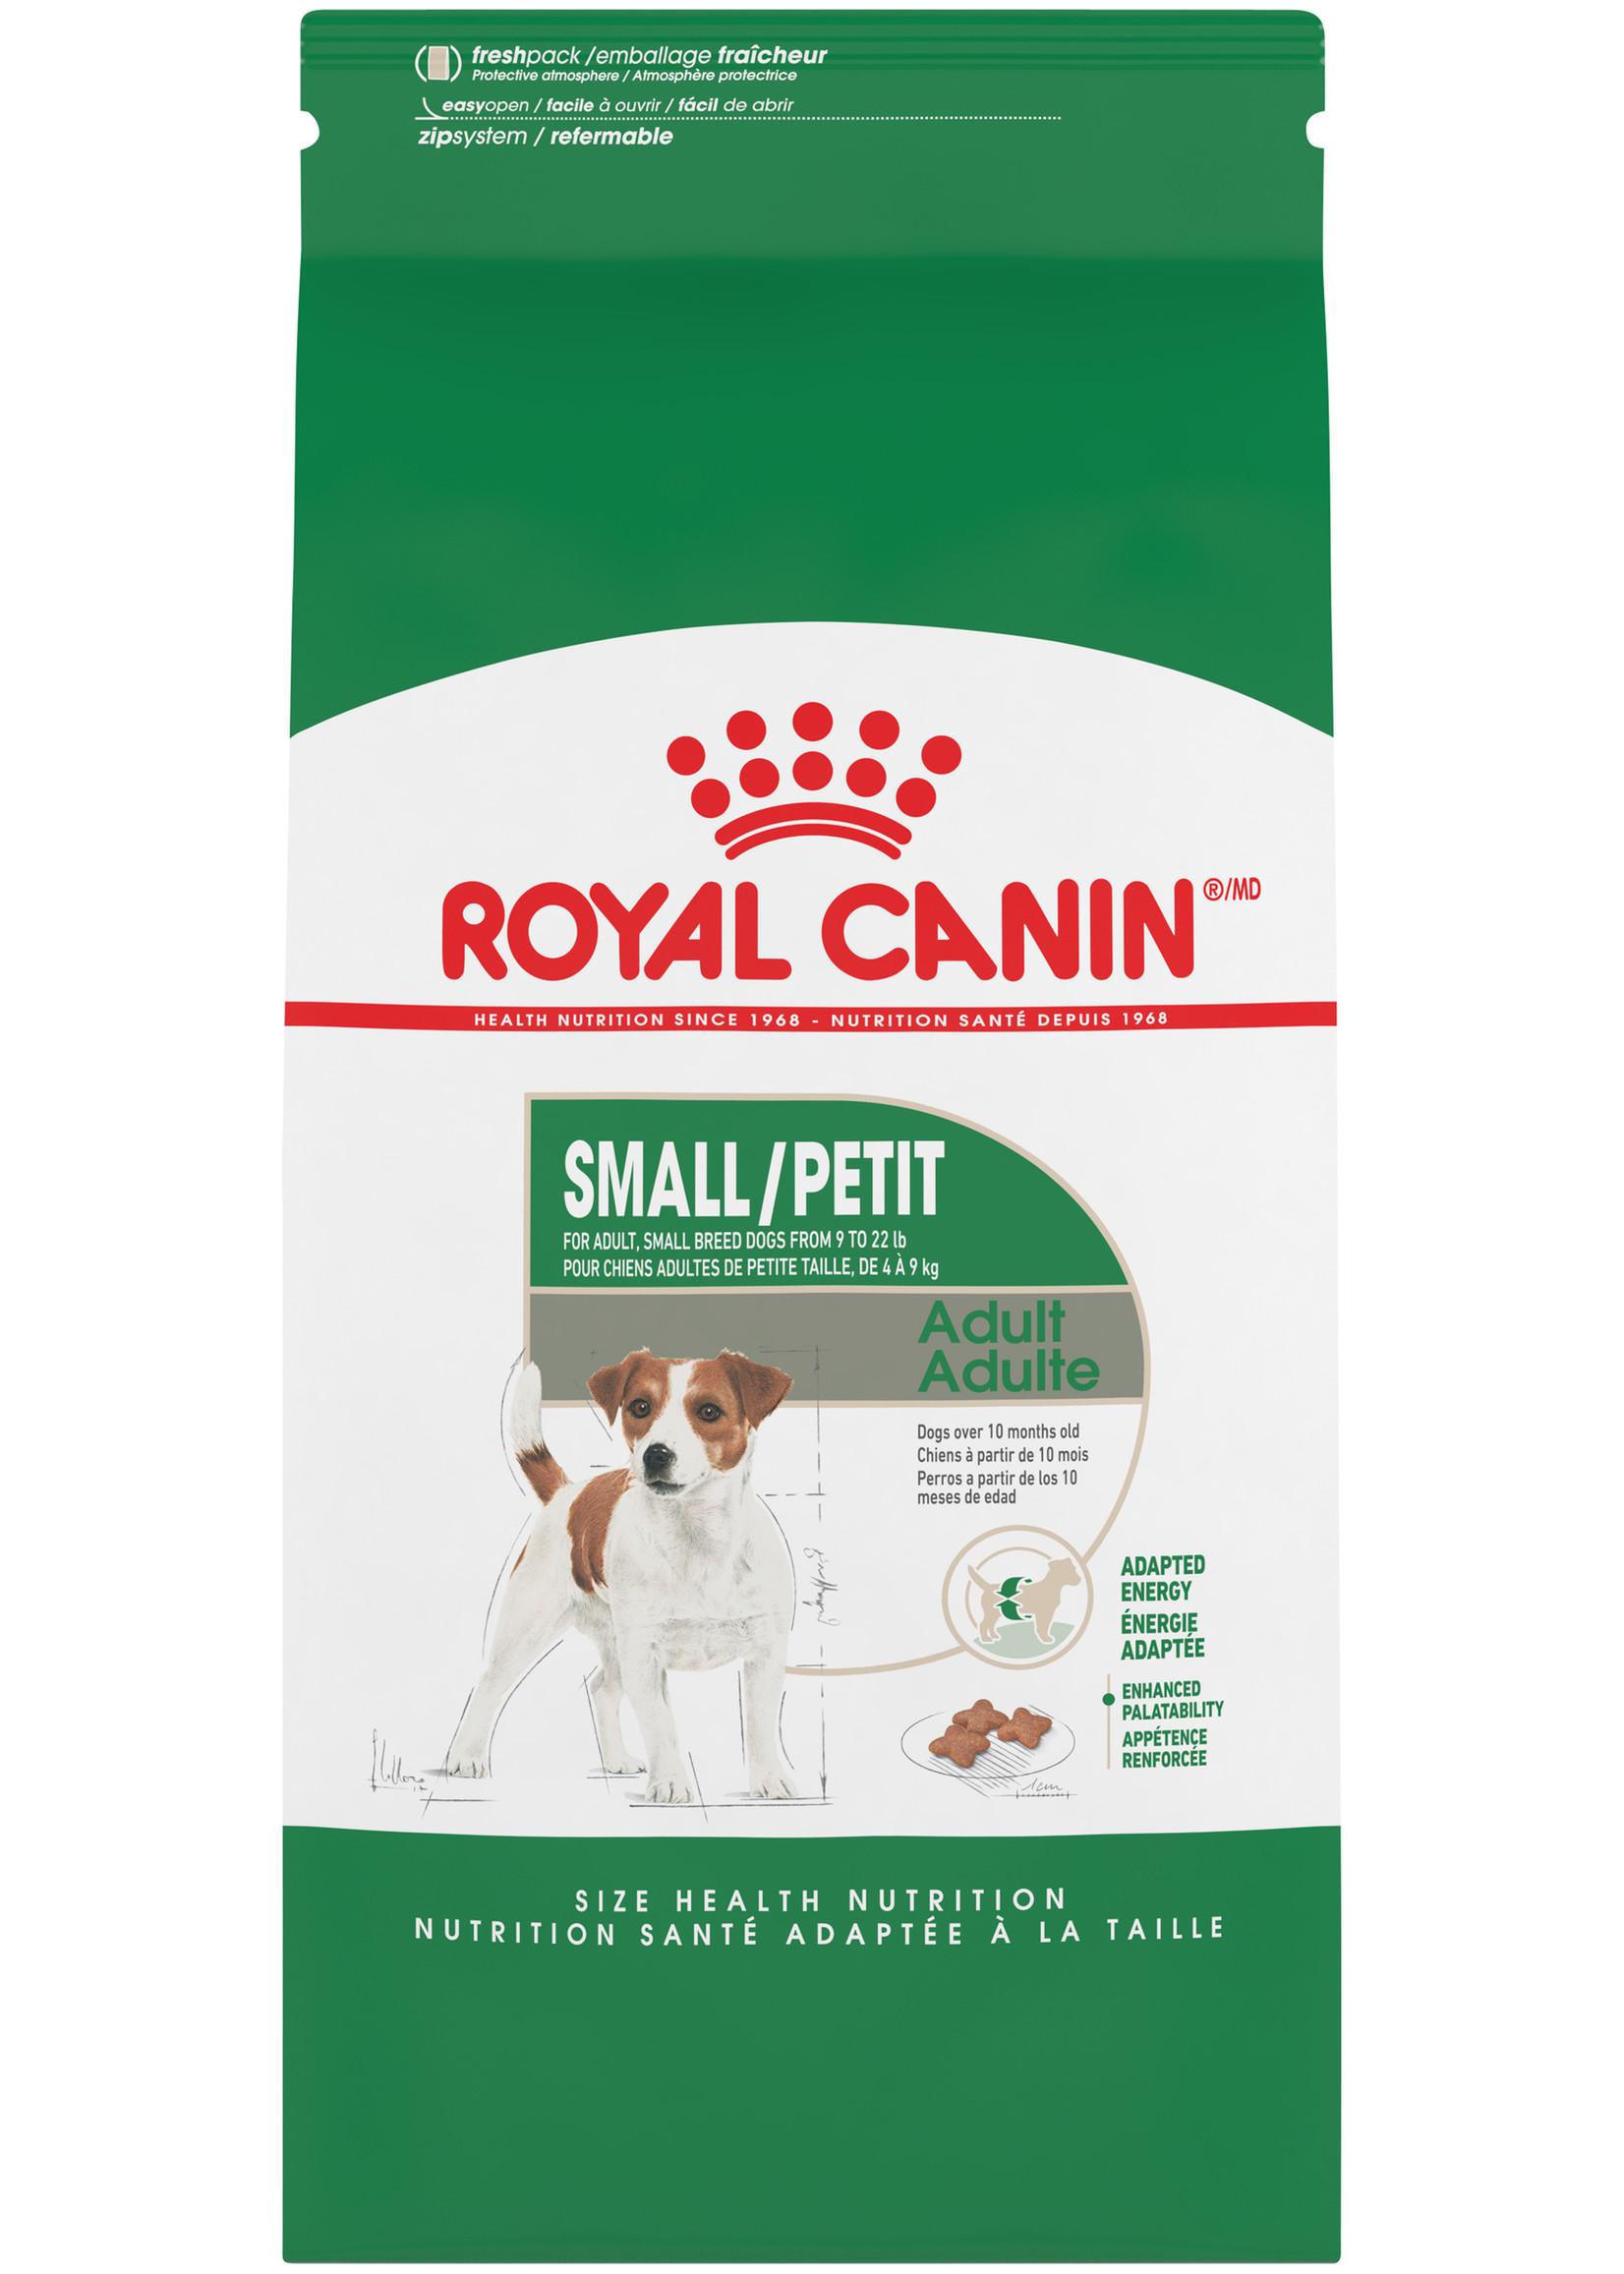 Royal Canin Royal Canin Dog Small Adult 4.4lb